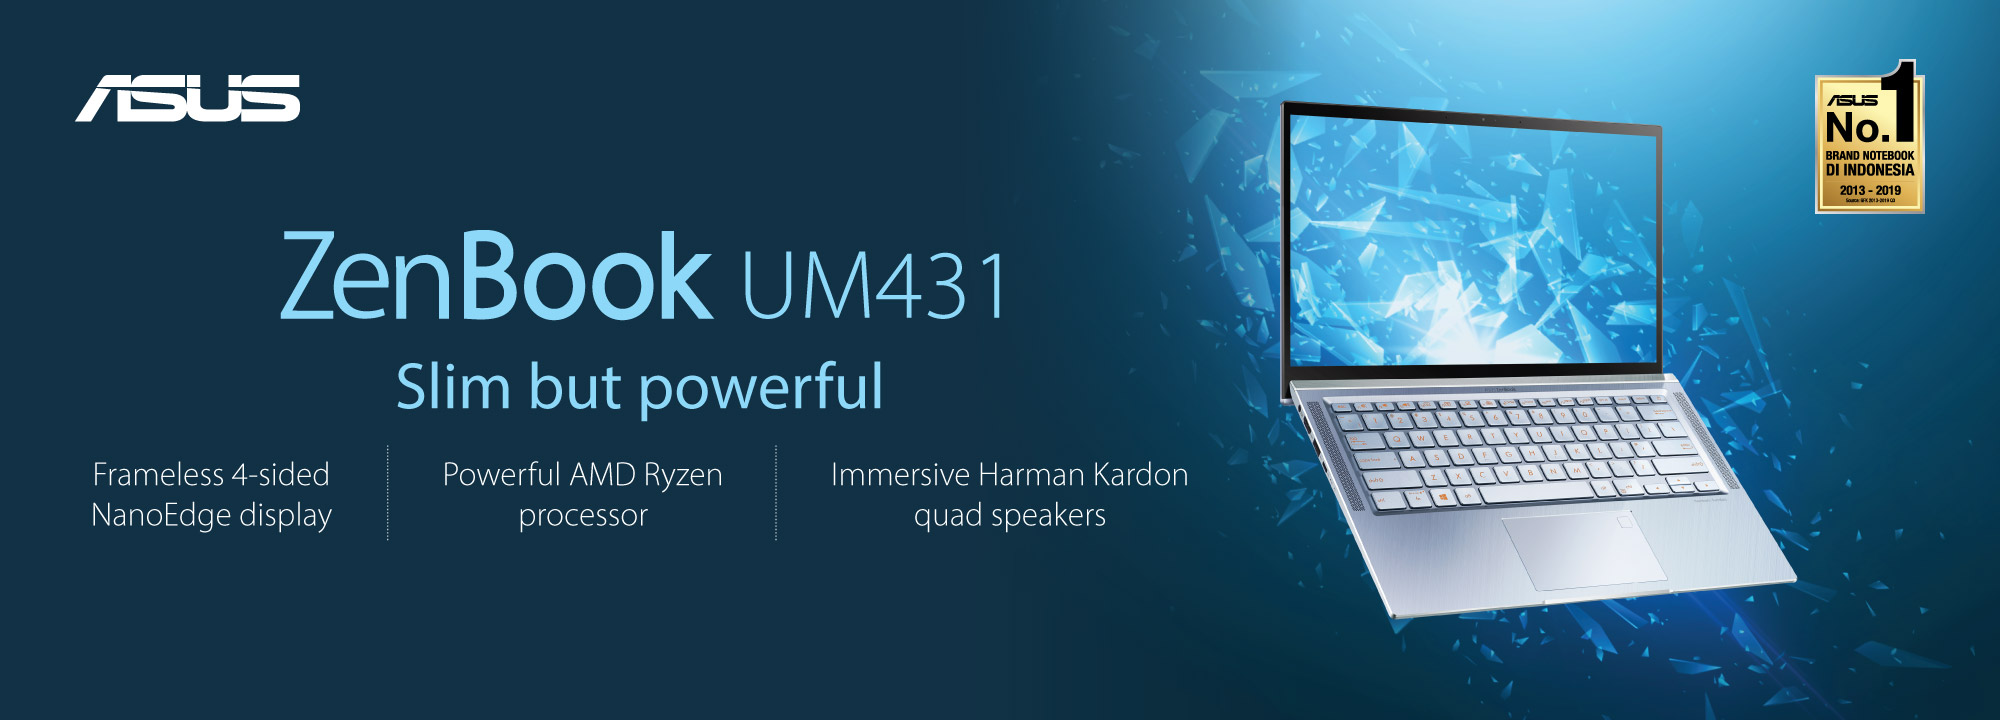 ASUS ZenBook 14 UM431DA Laptop